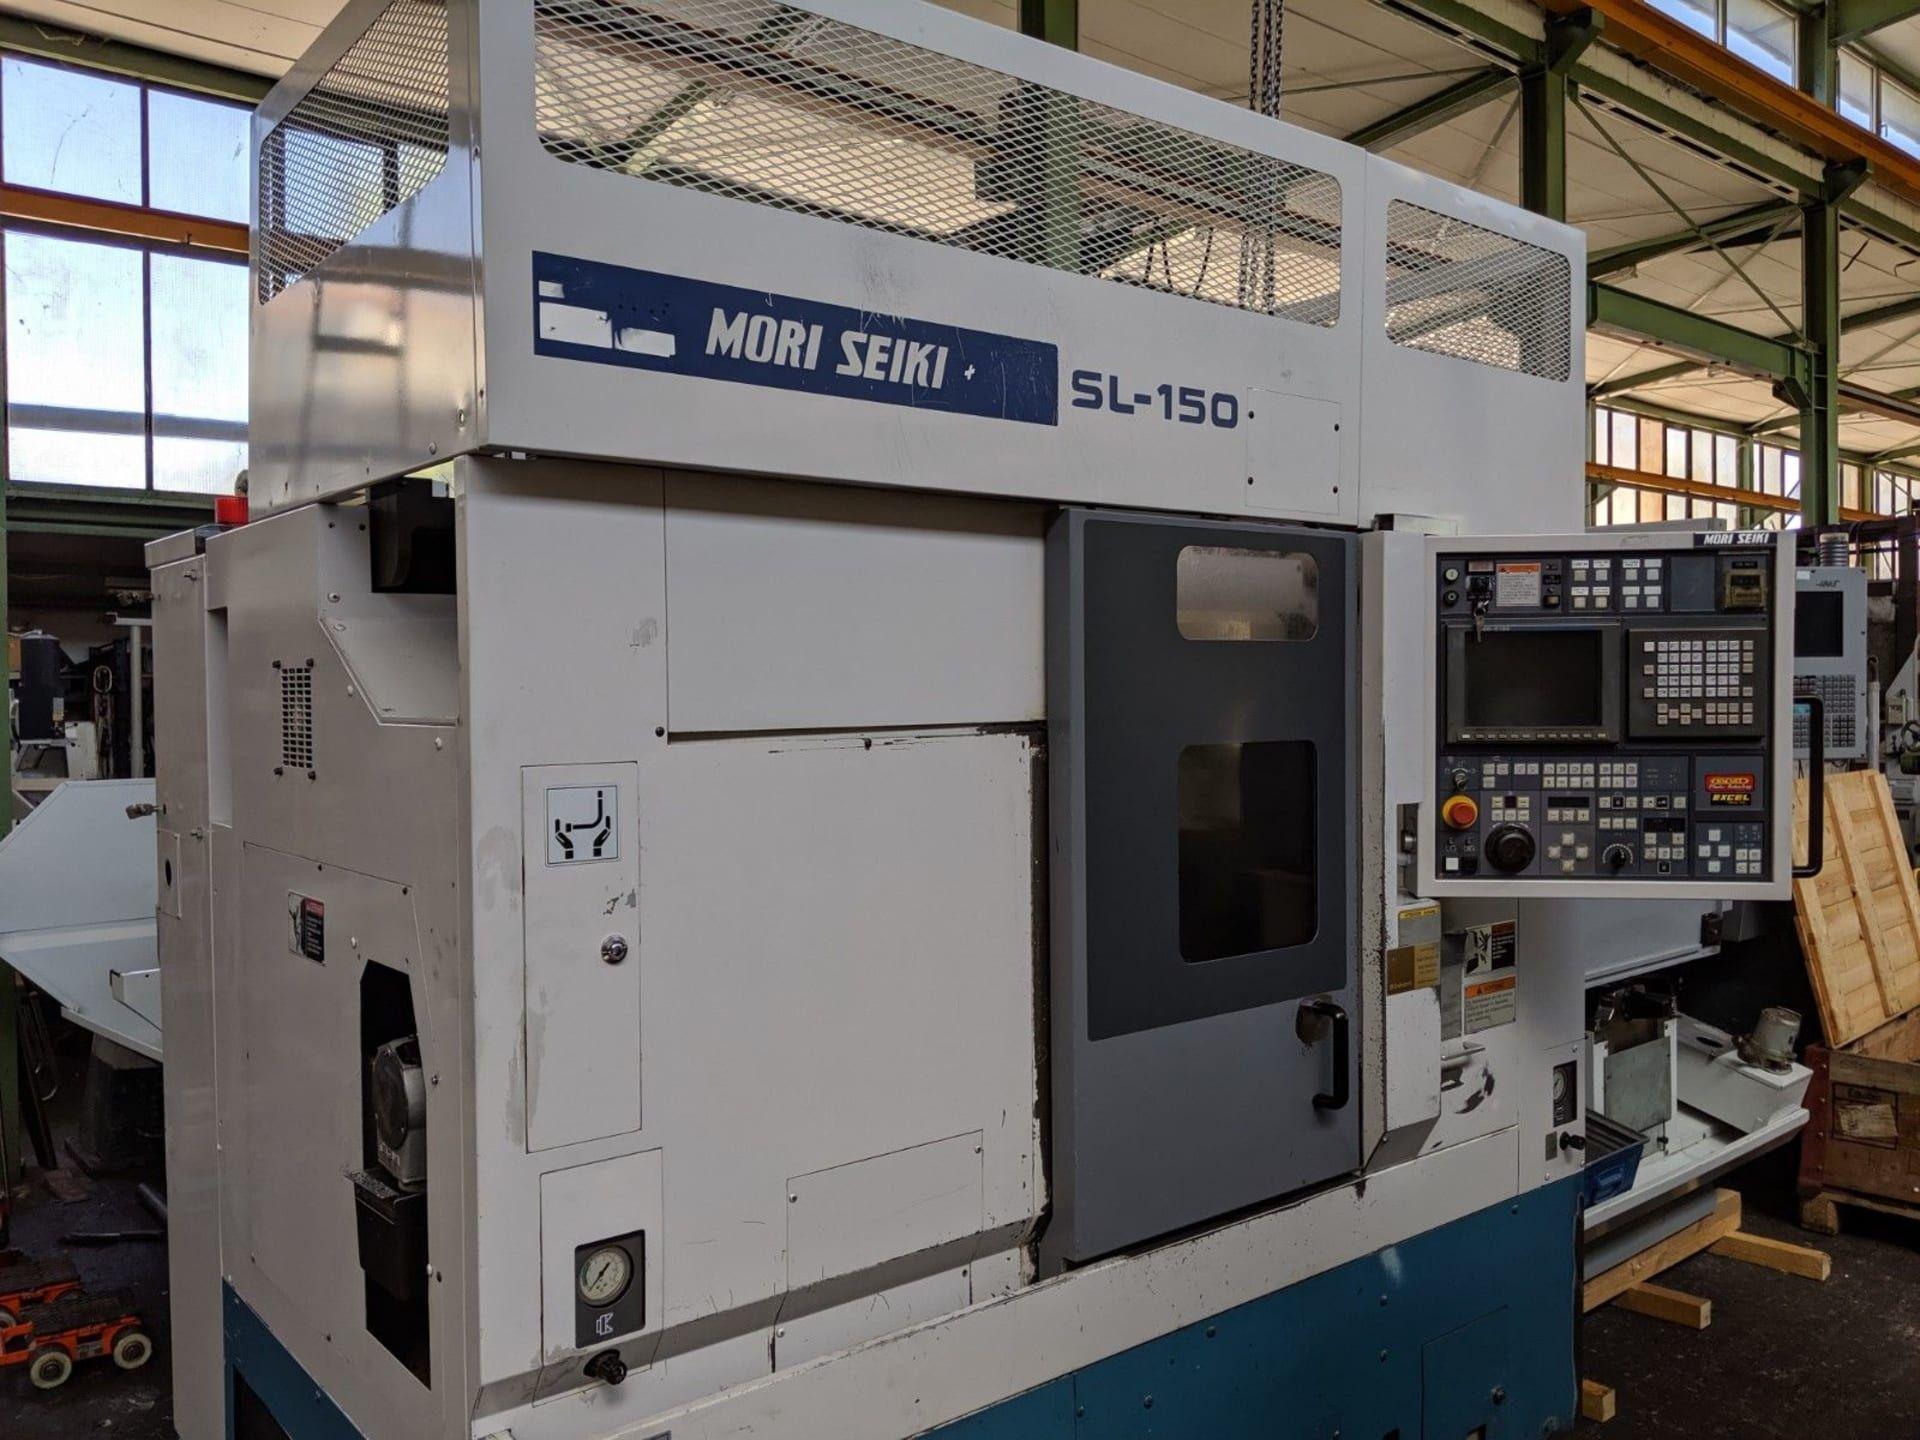 MORNA SEIKI SL-150 MC Drehmaschine CNC